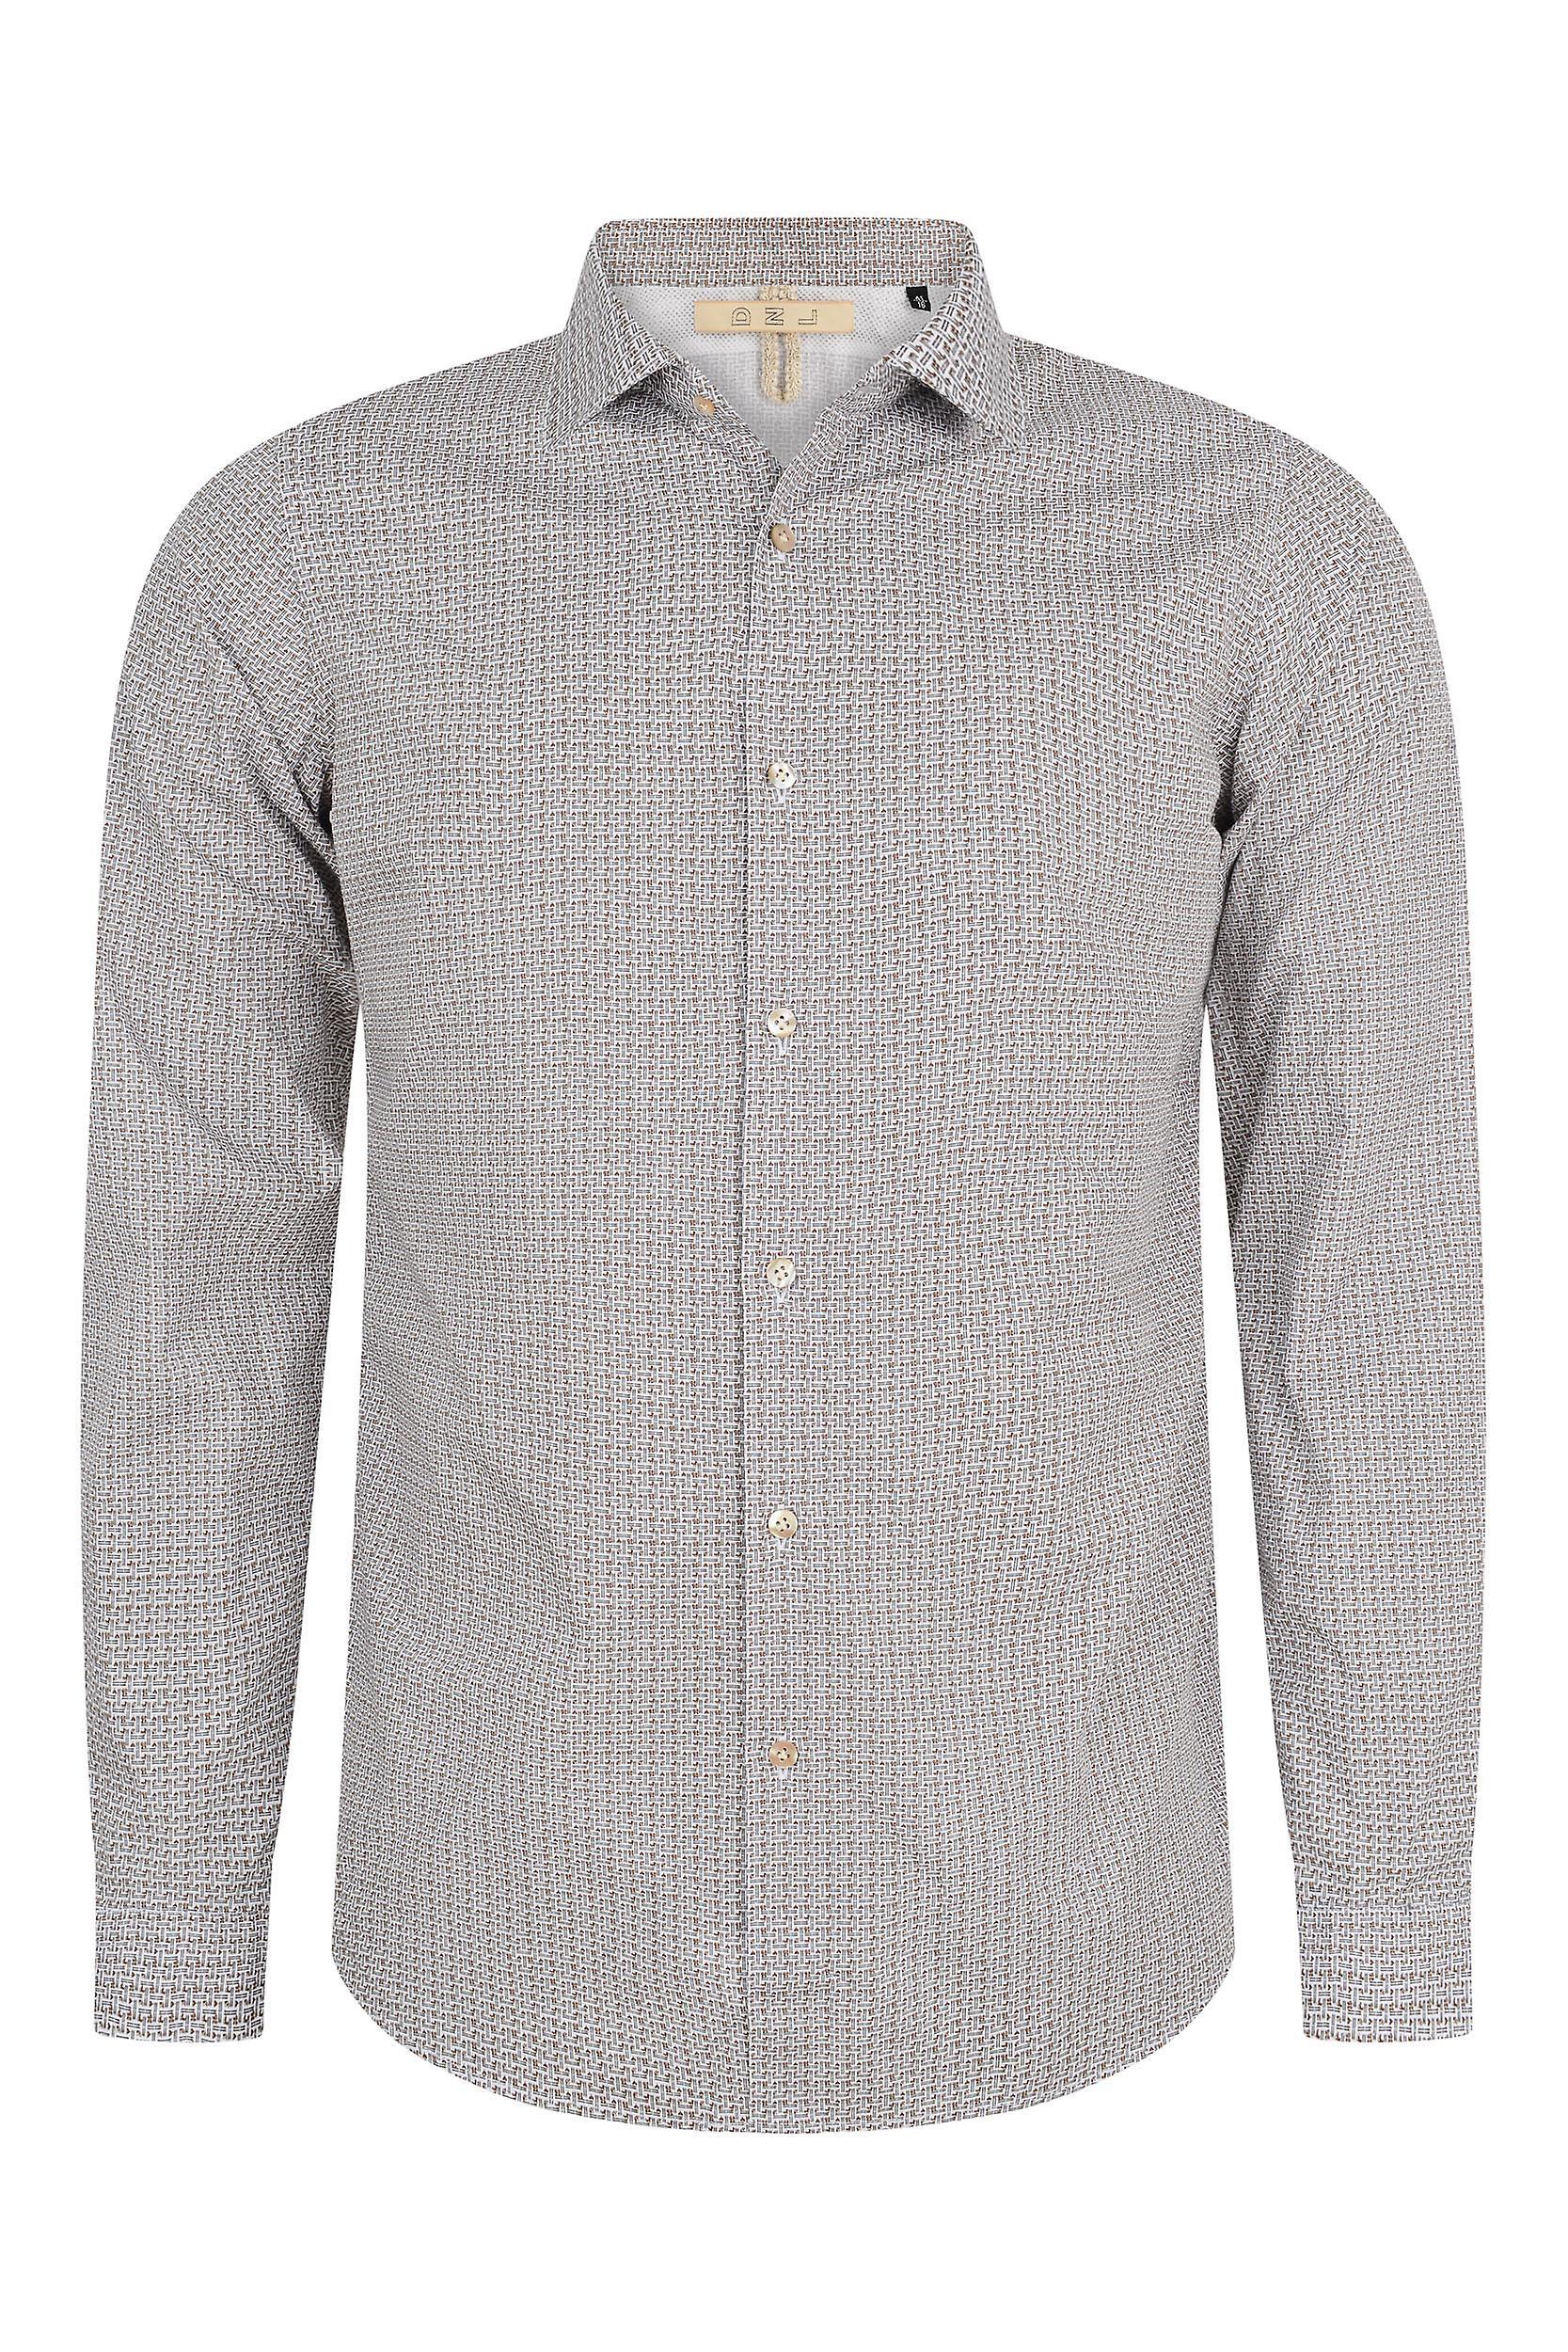 Fabio Giovanni Anzano Shirt - Mens High Quality Crisp Italian Cotton Poplin Shirt